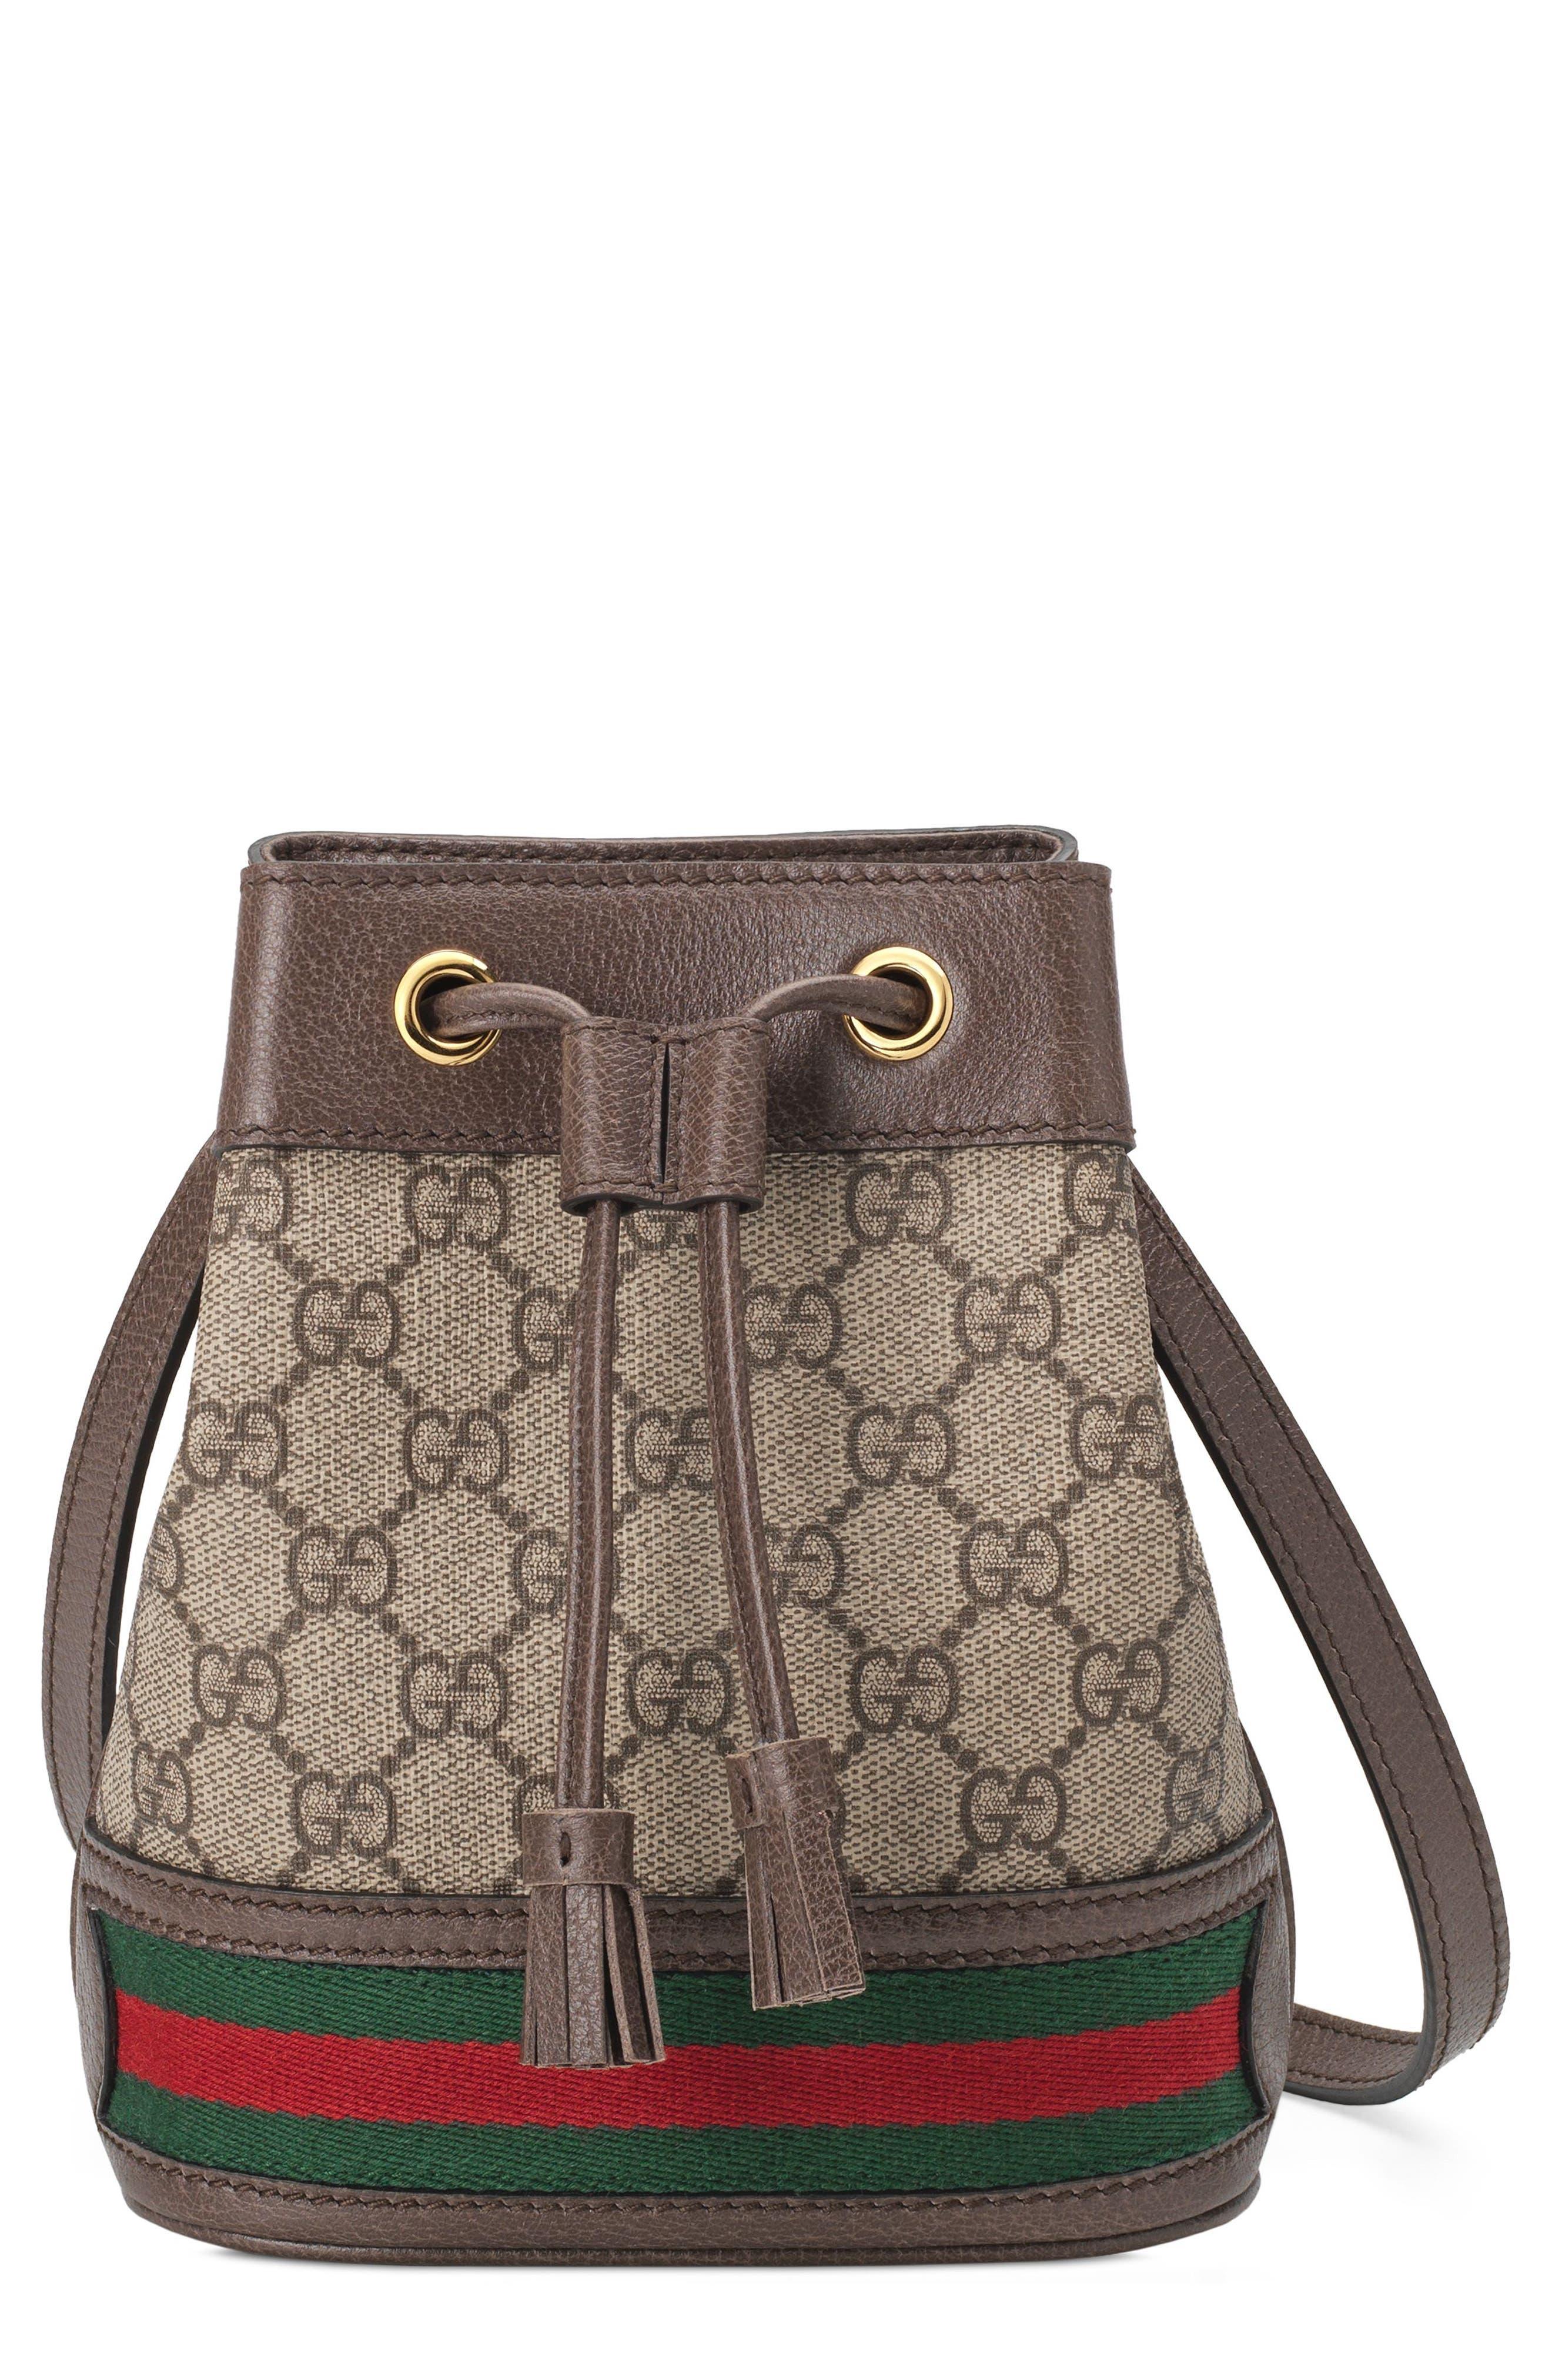 Mini Ophidia GG Supreme Bucket Bag,                         Main,                         color, BEIGE EBONY/ NEW ACERO